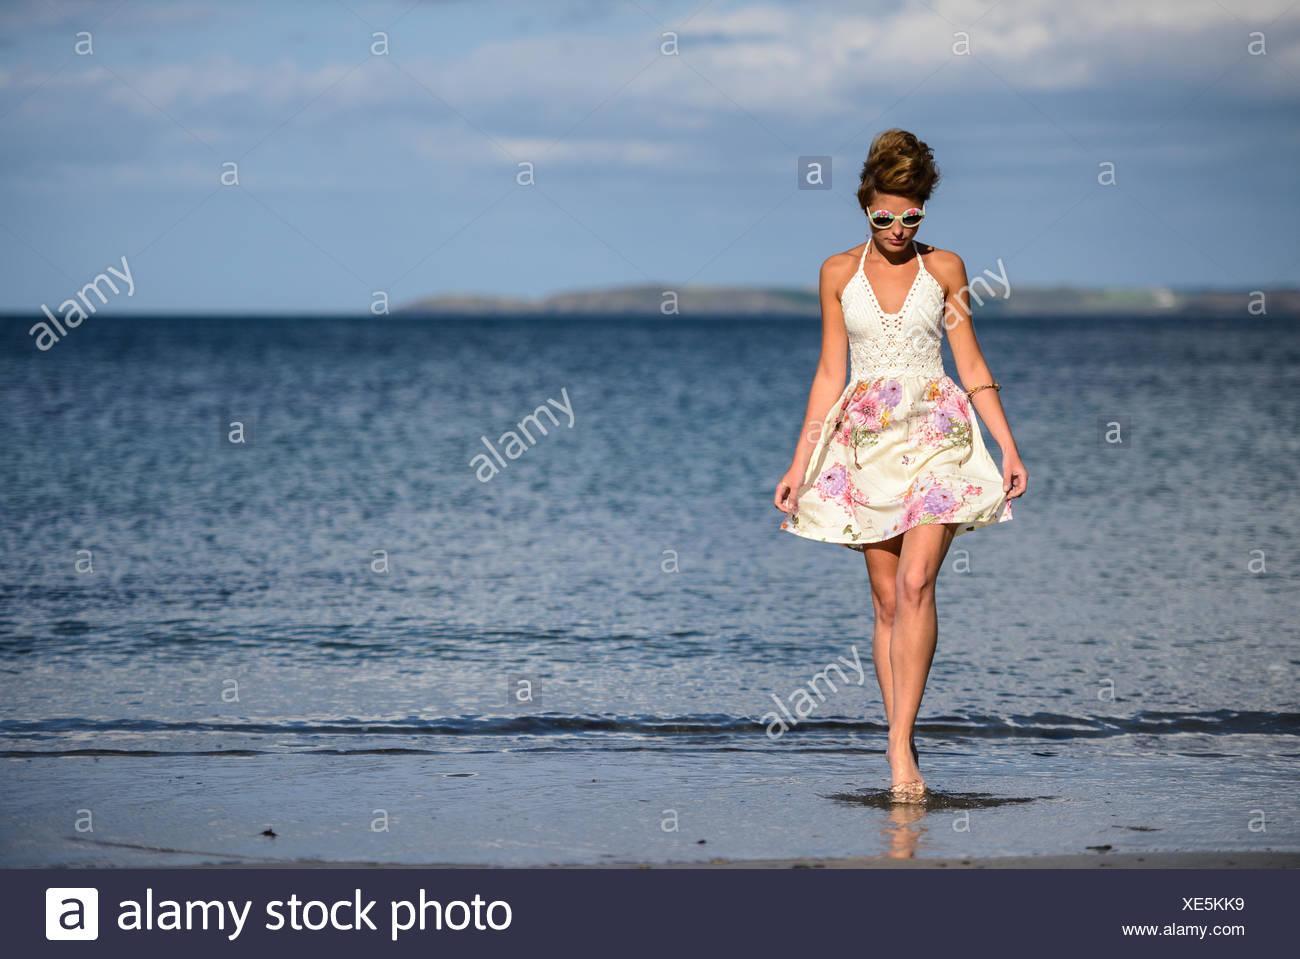 Young woman walking along the beach - Stock Image